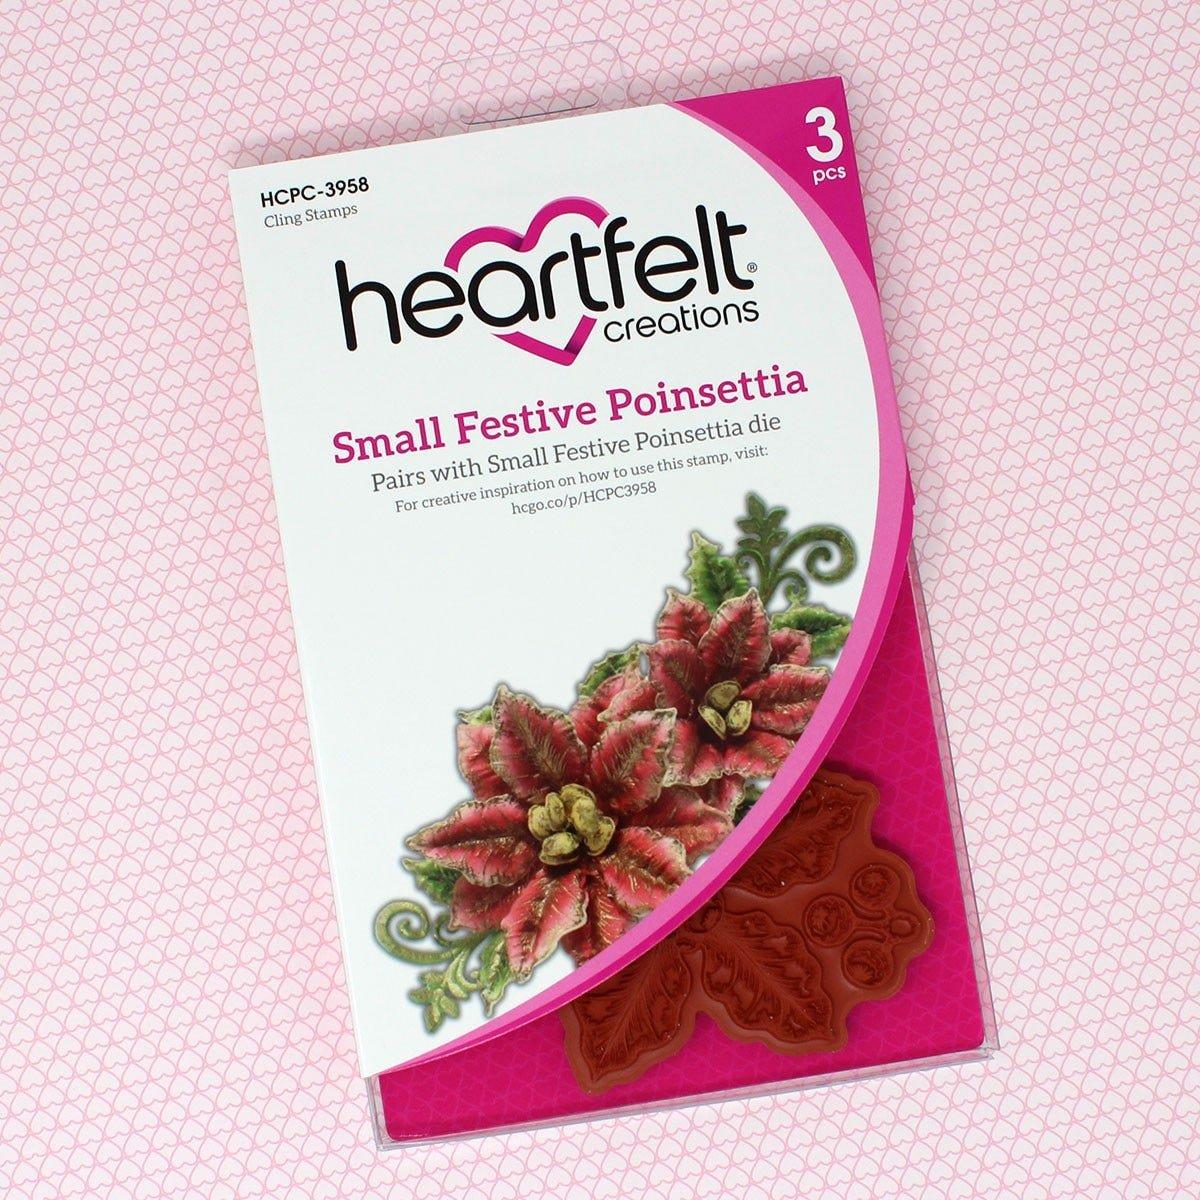 Heartfelt Creations - Small Festive Poinsettia Cling Stamp Set